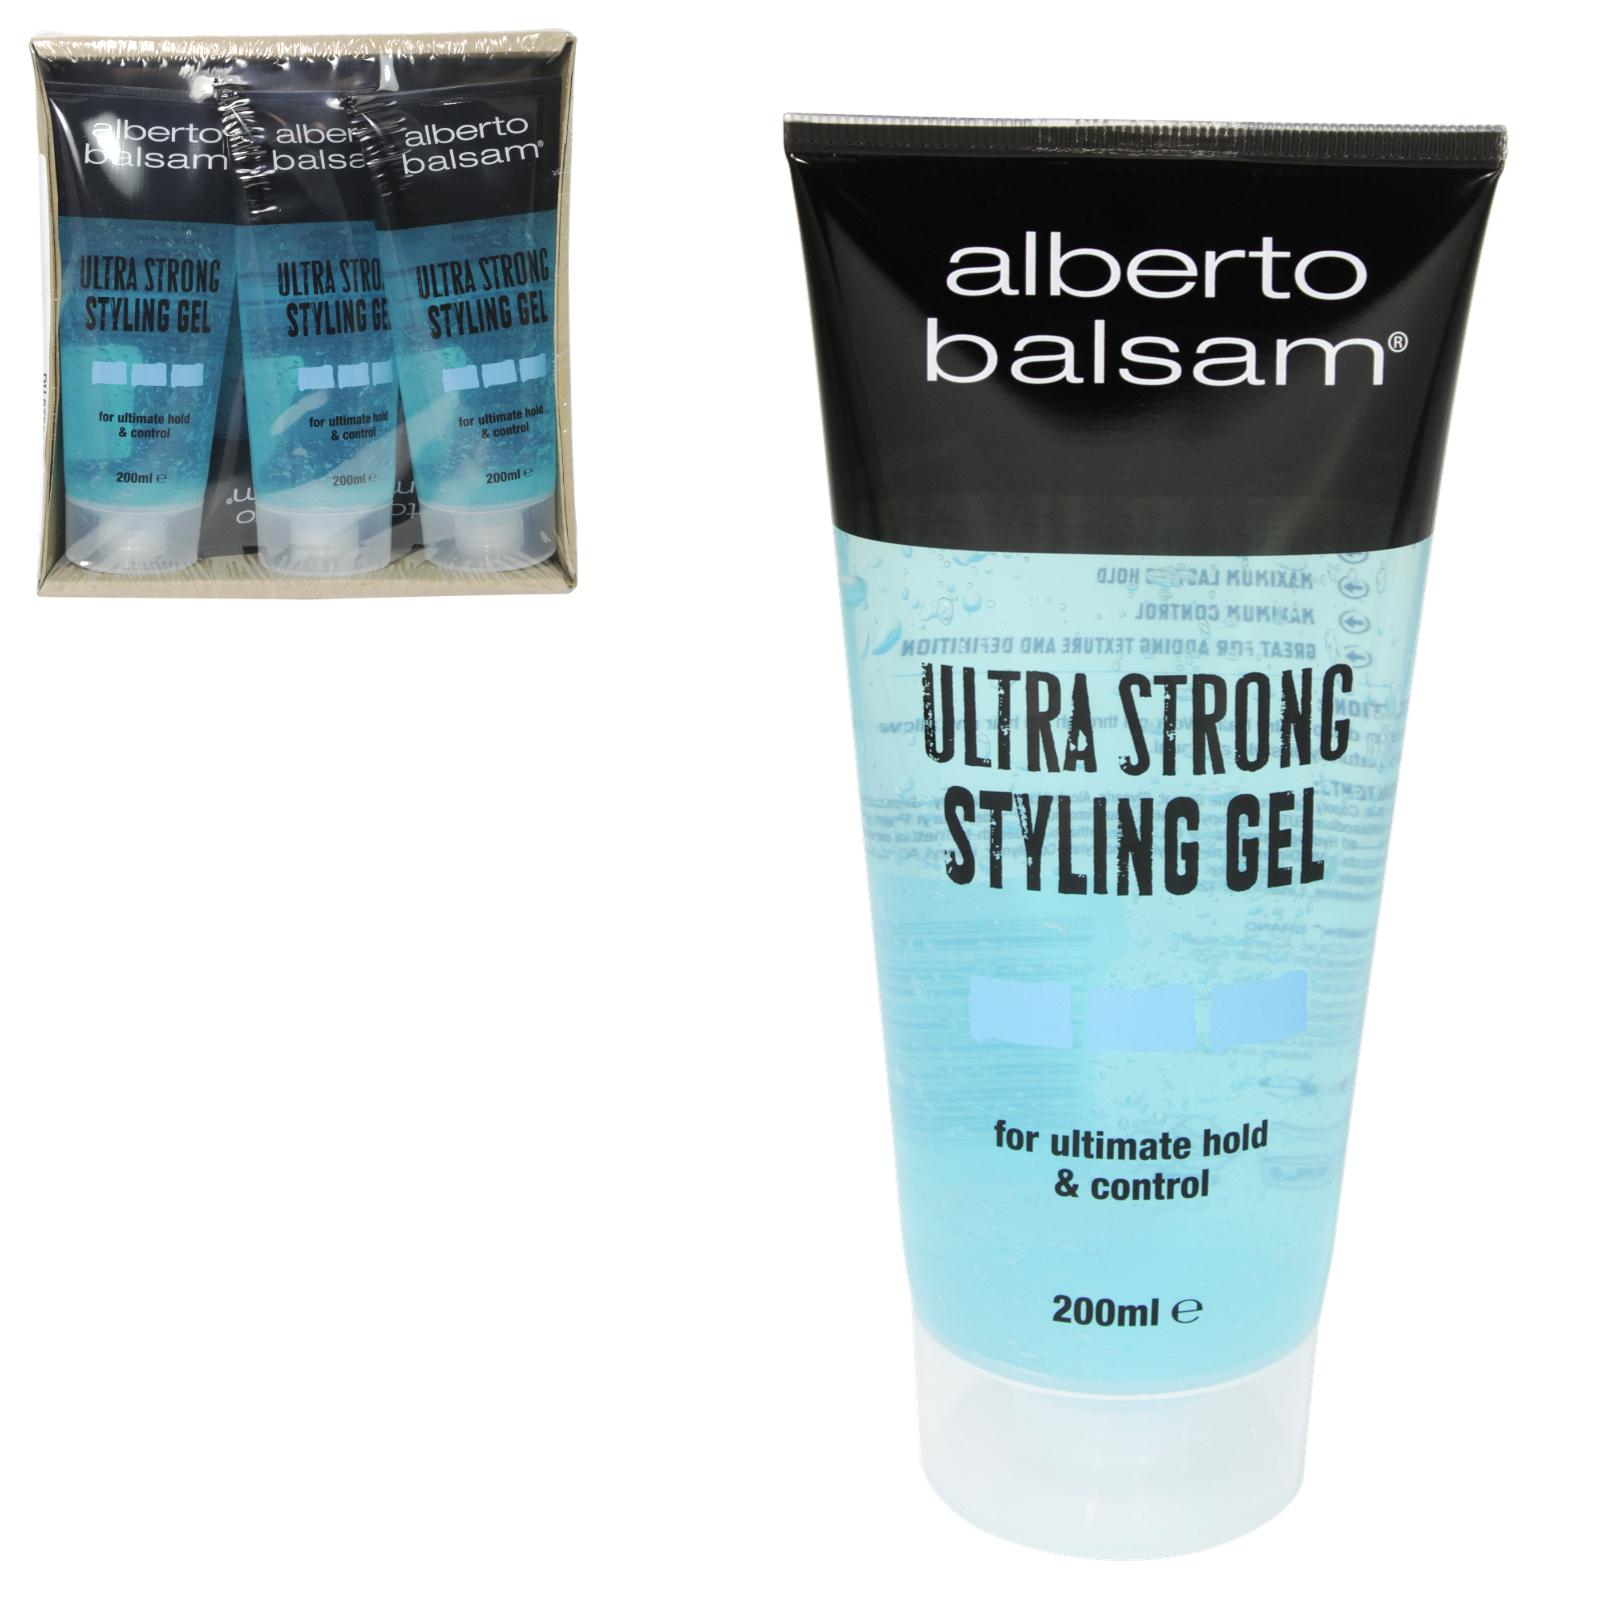 ALBERTO BALSAM HAIR GEL 200ML ULTRA STRONG X6